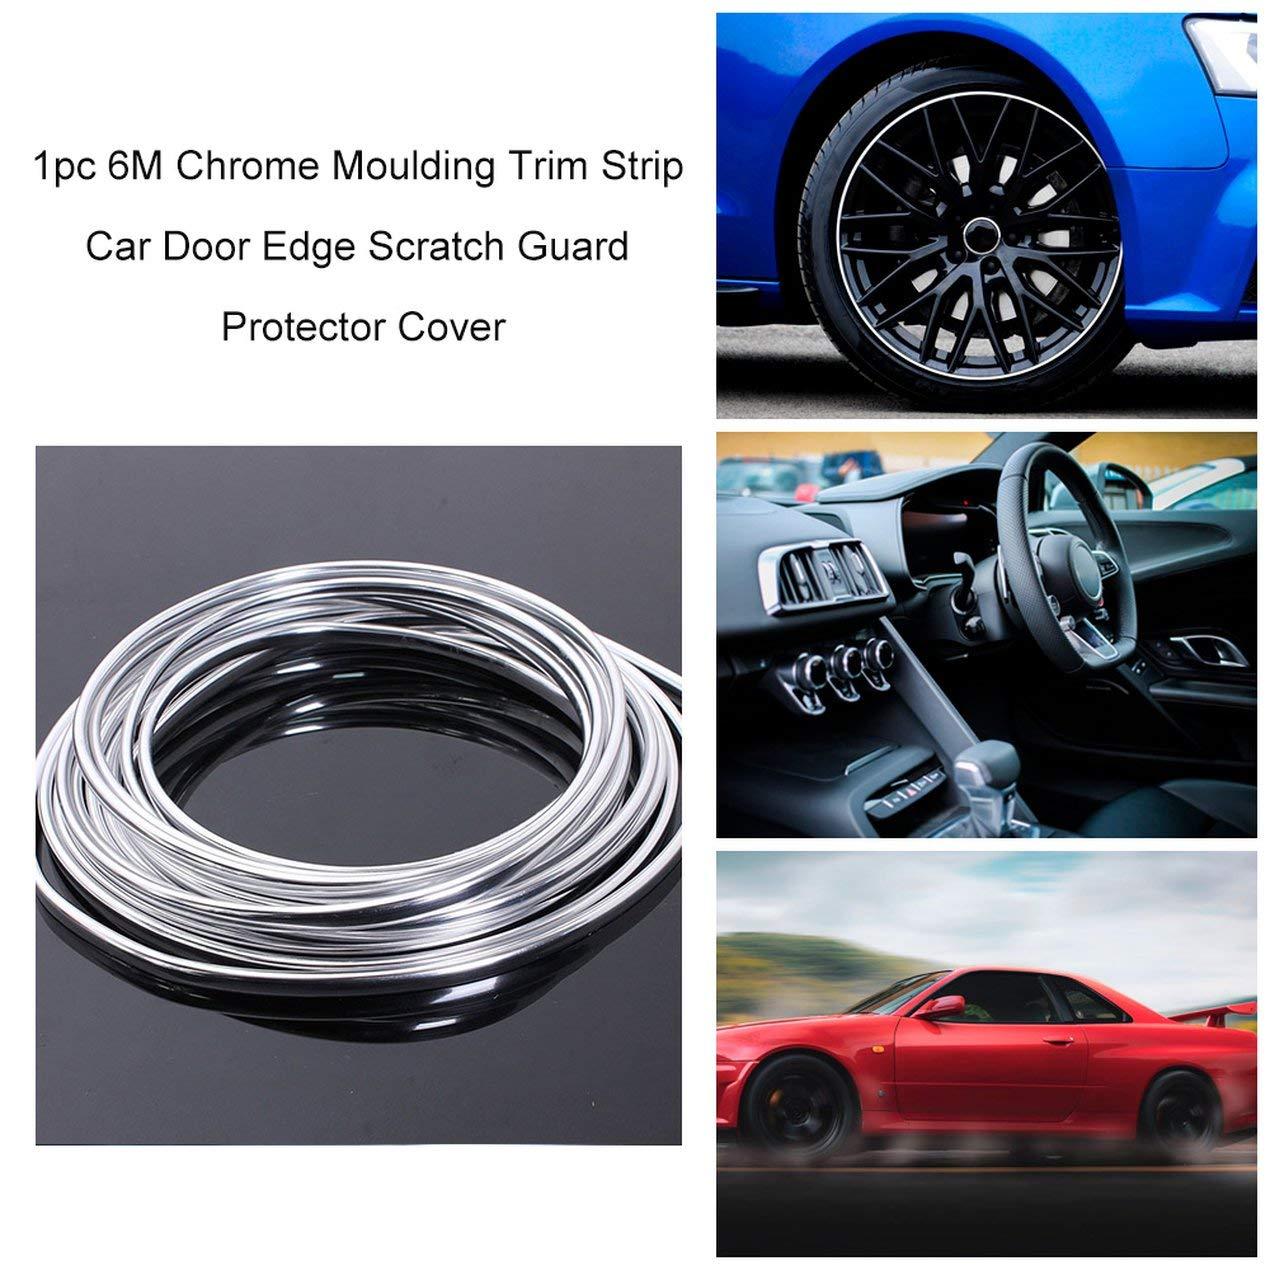 Nuevo 6M moldura cromada moldura tira de puerta de coche borde protector de ara/ñazos cubierta de tira rollo plata